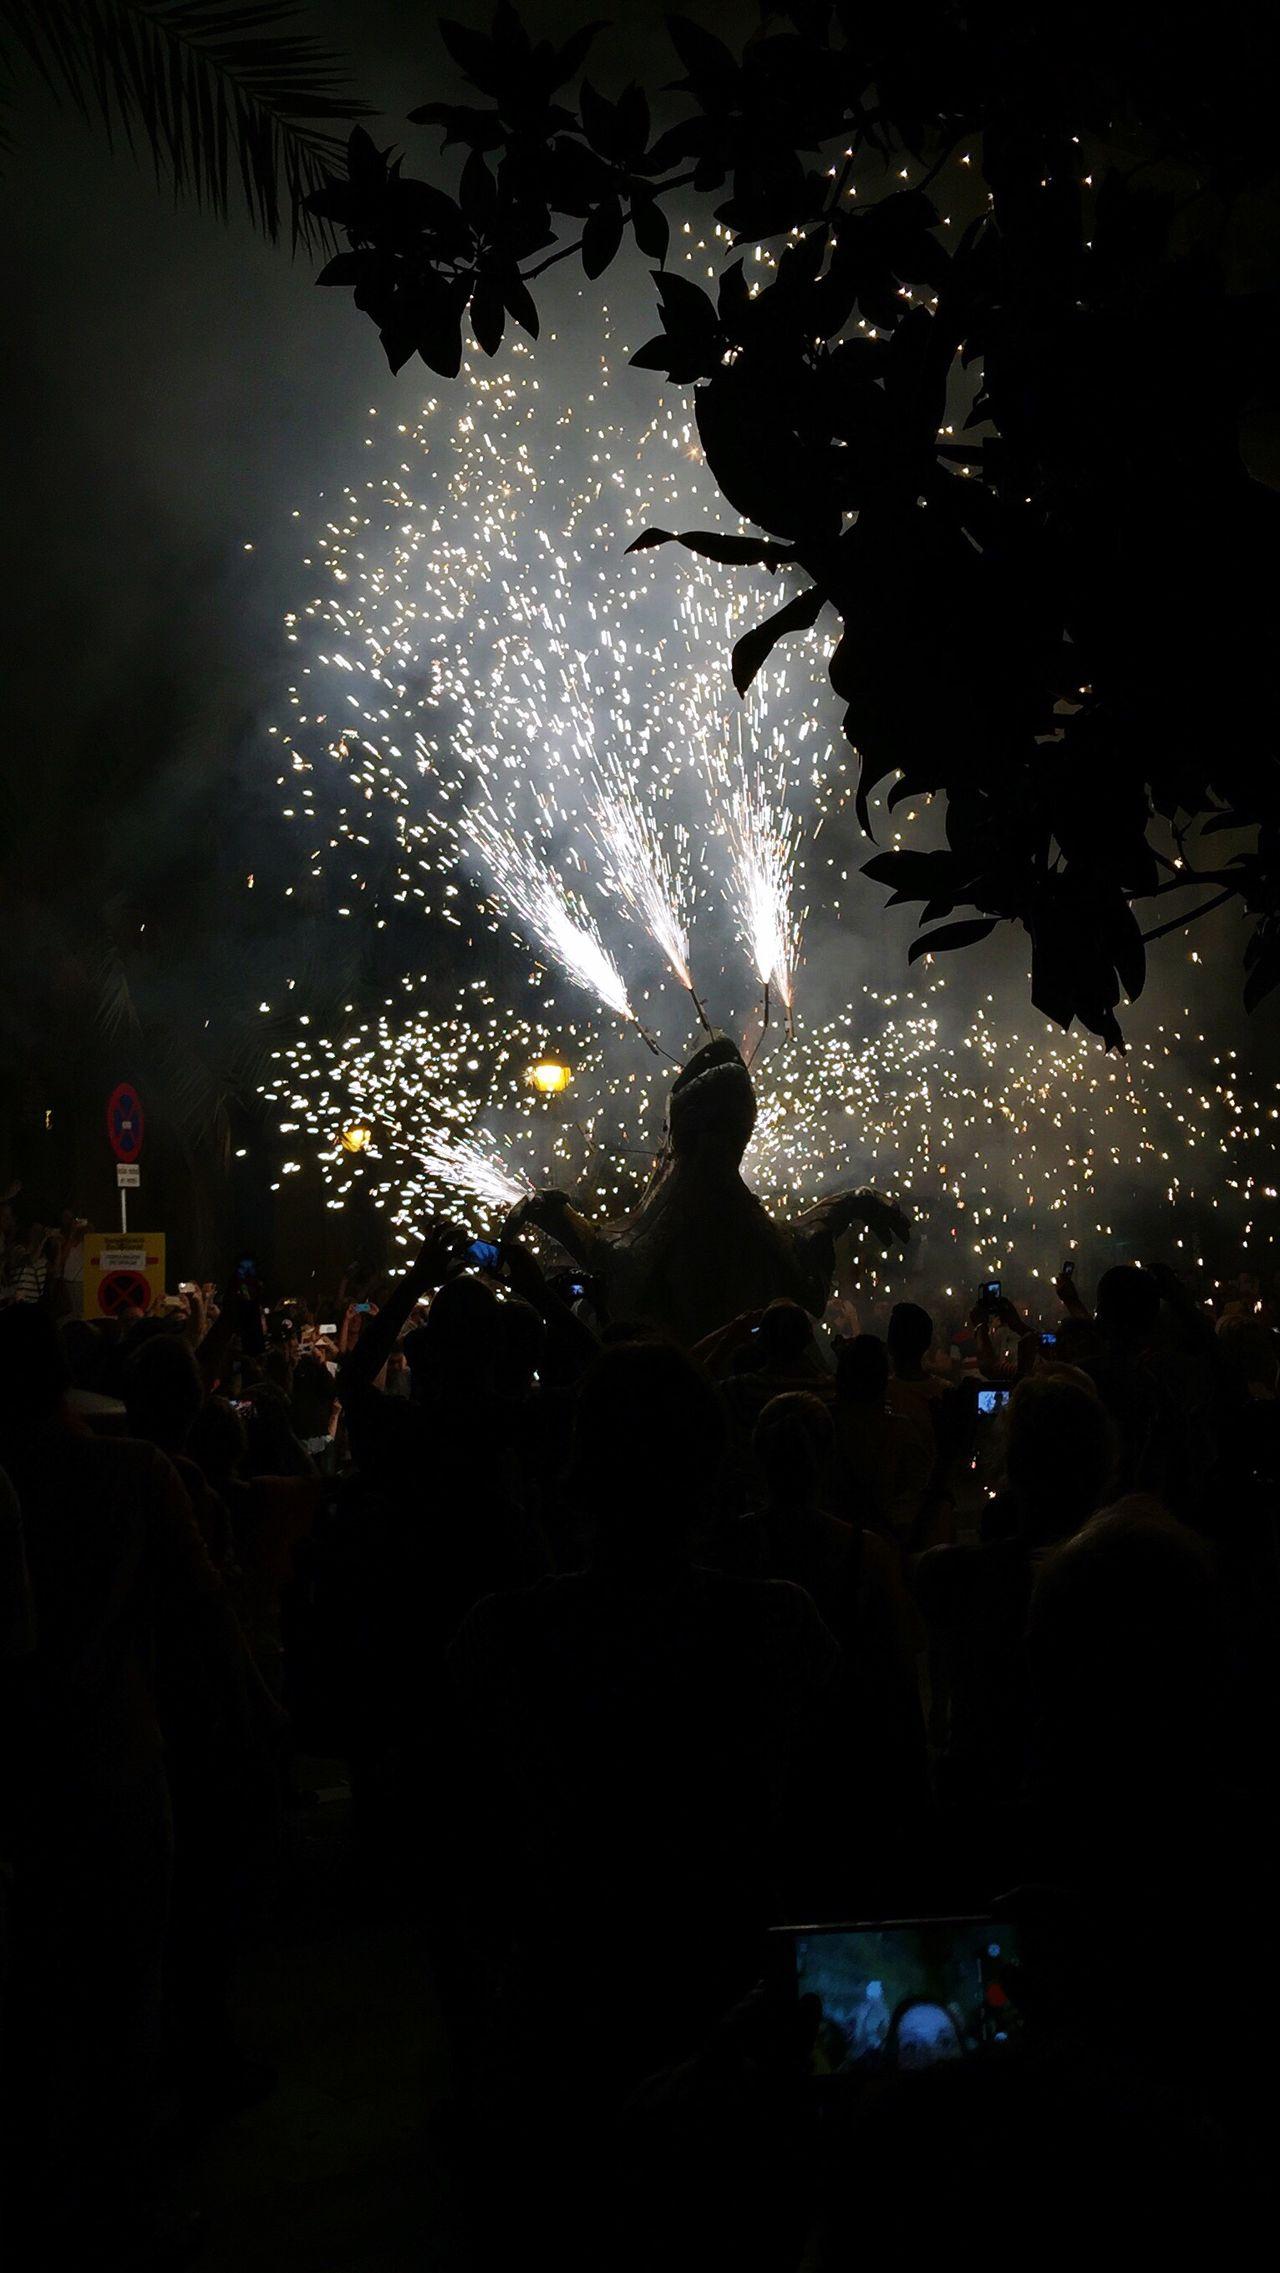 Festival La Mercè in Barcelona with the Correfoc (dancing devils) Correfoc Barcelona Barcelona La Merce La Merce Festival La Merce La Merce Tourist In Barcelona Firework